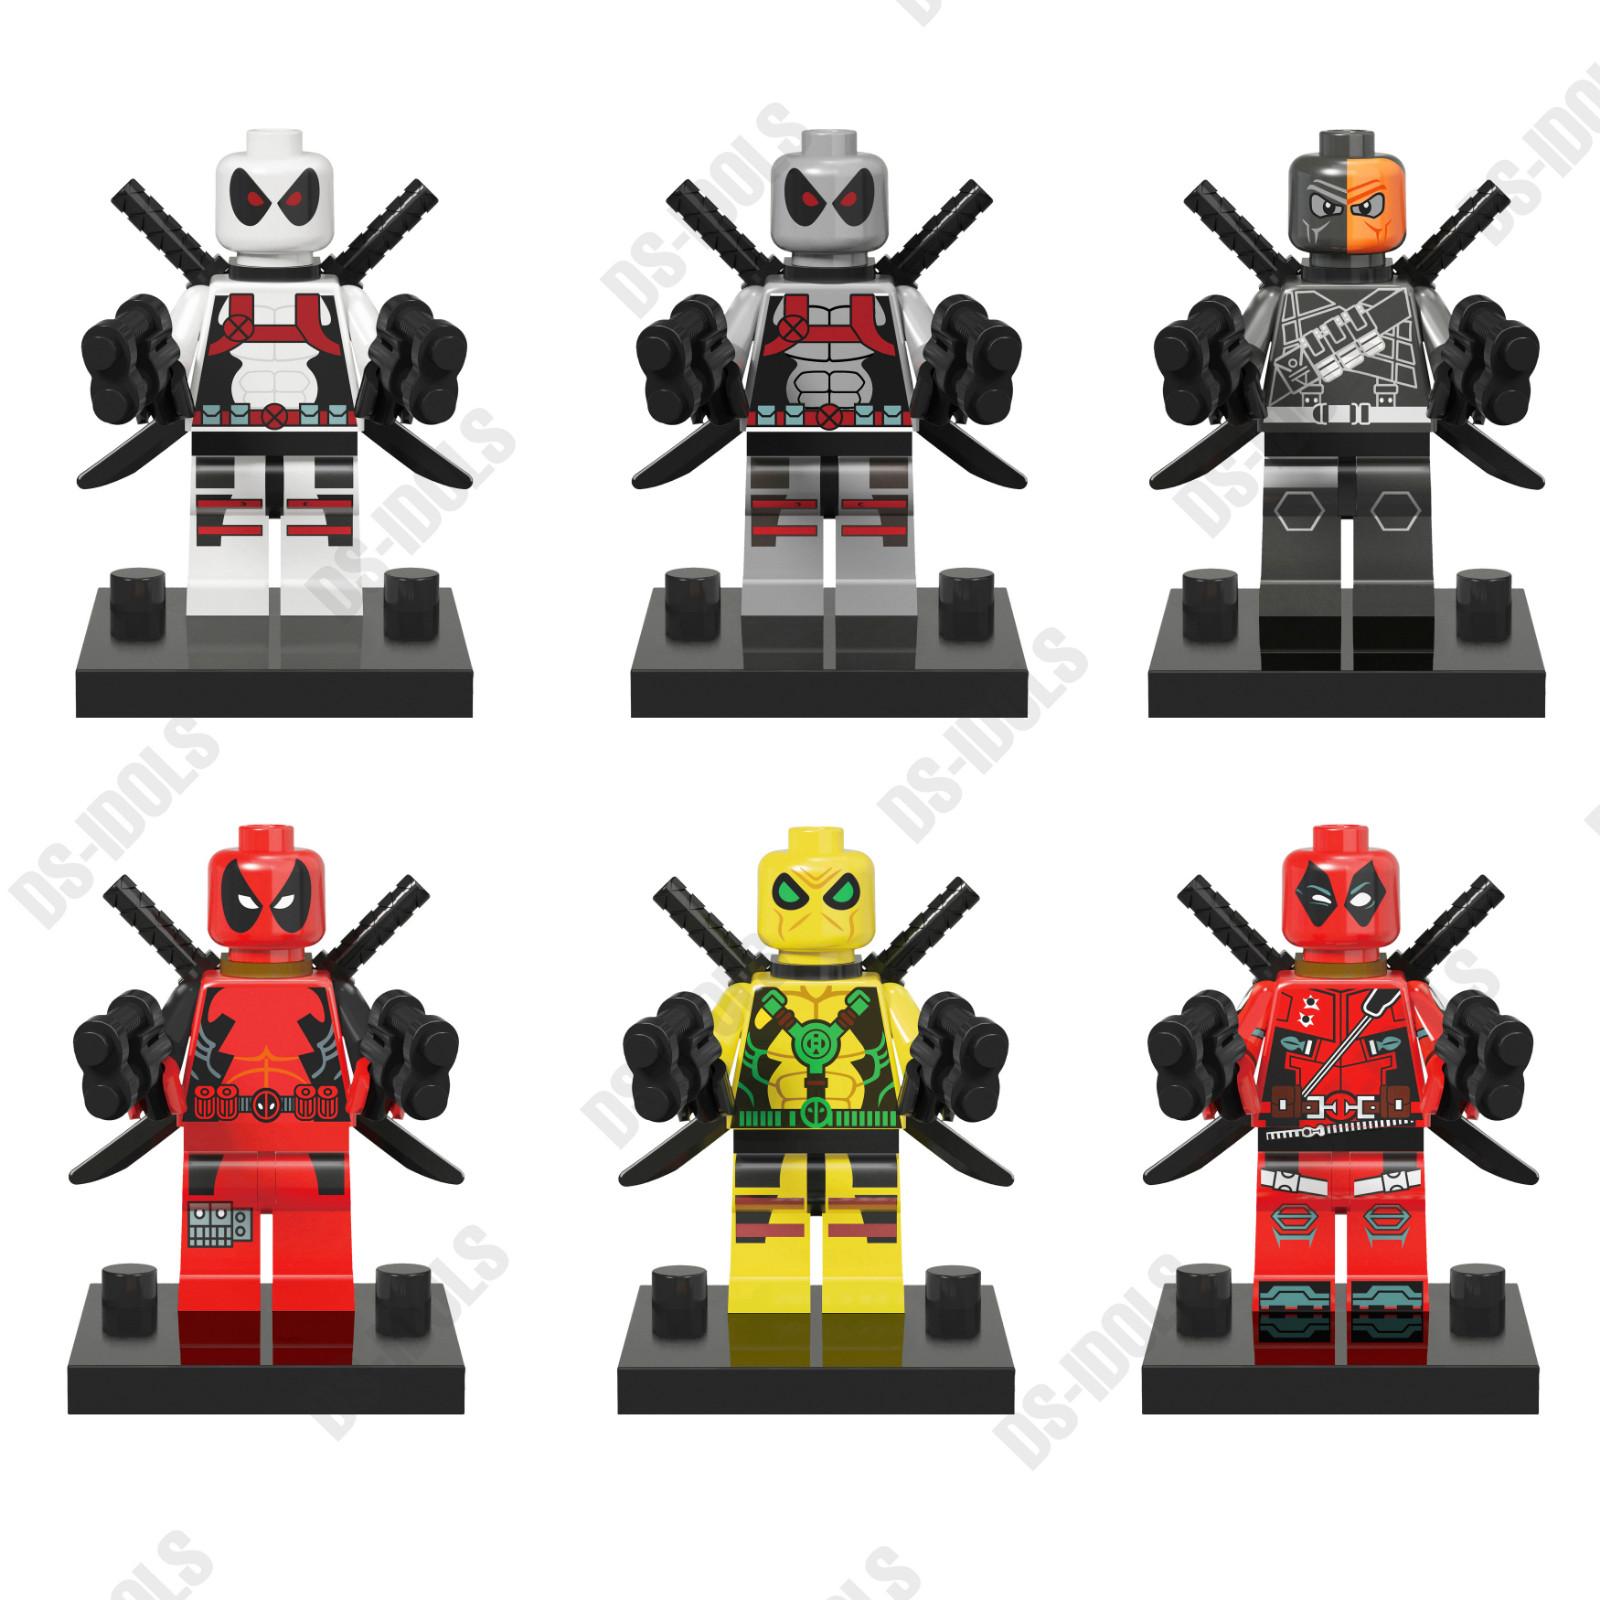 LEGO Super Heroes Deadpool Minifigure | Bricktraders |Lego Marvel Superheroes Deadpool Set